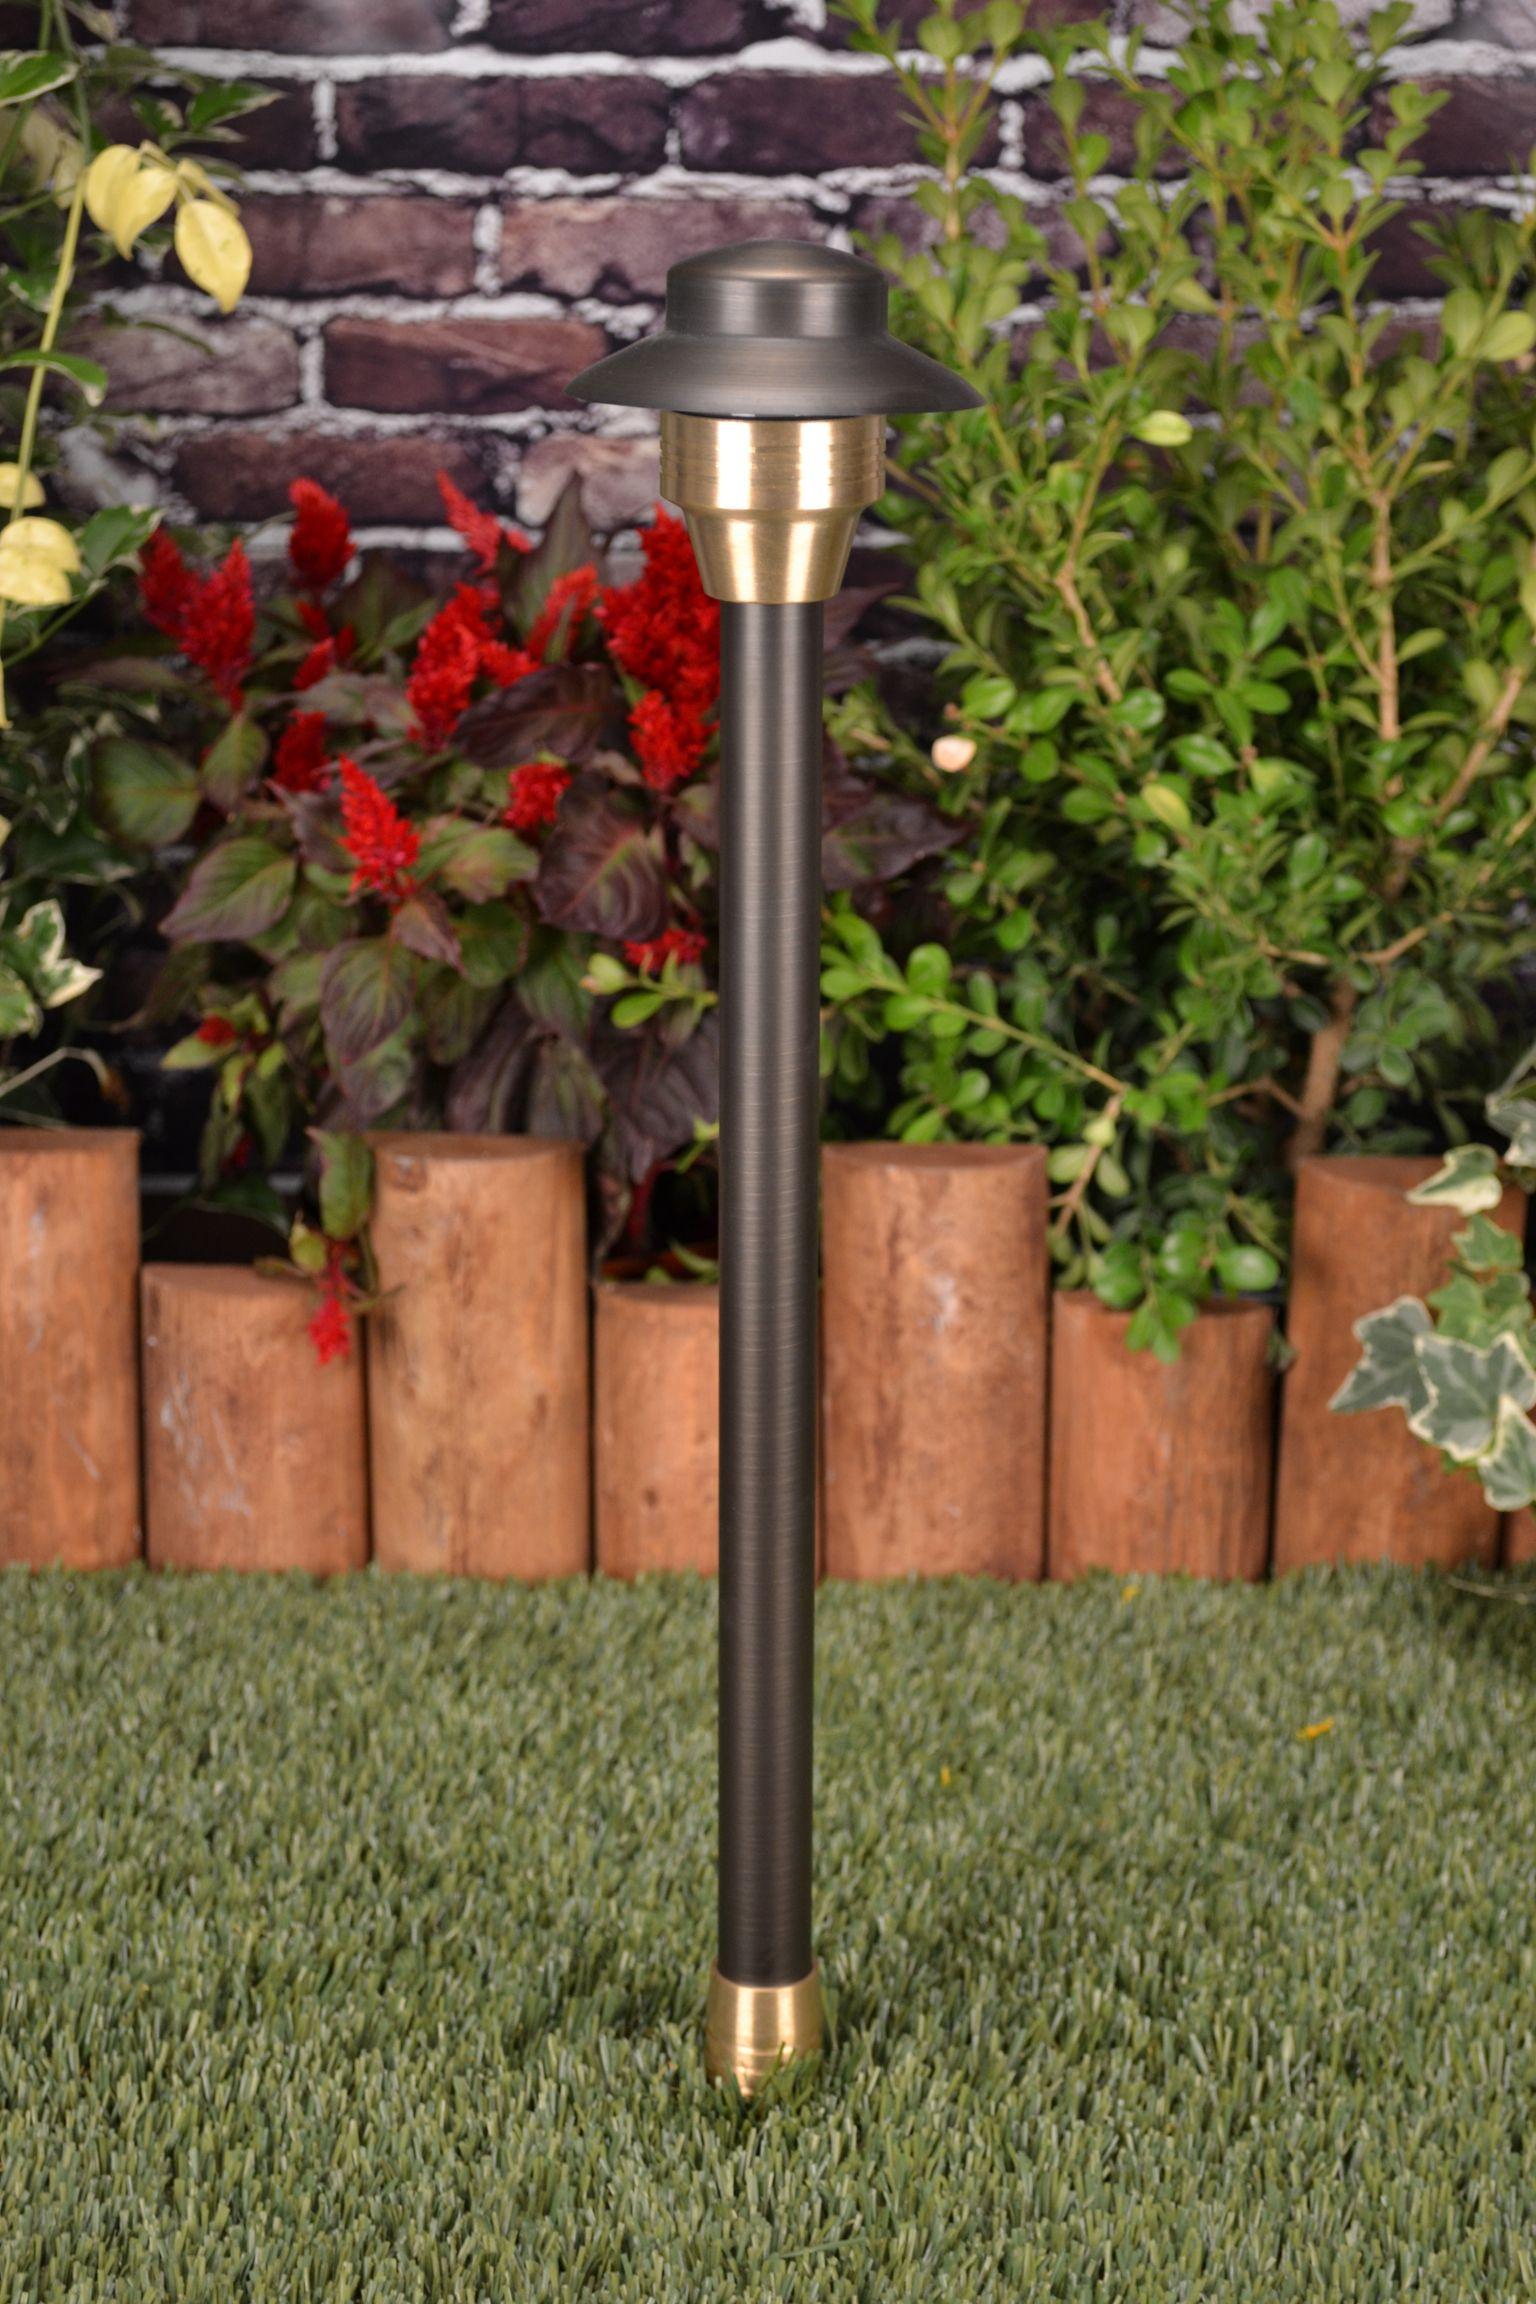 Kichler Outdoor Landscape Lighting Replacement Parts Outdoor Landscaping Outdoor Landscape Lighting Landscape Lighting